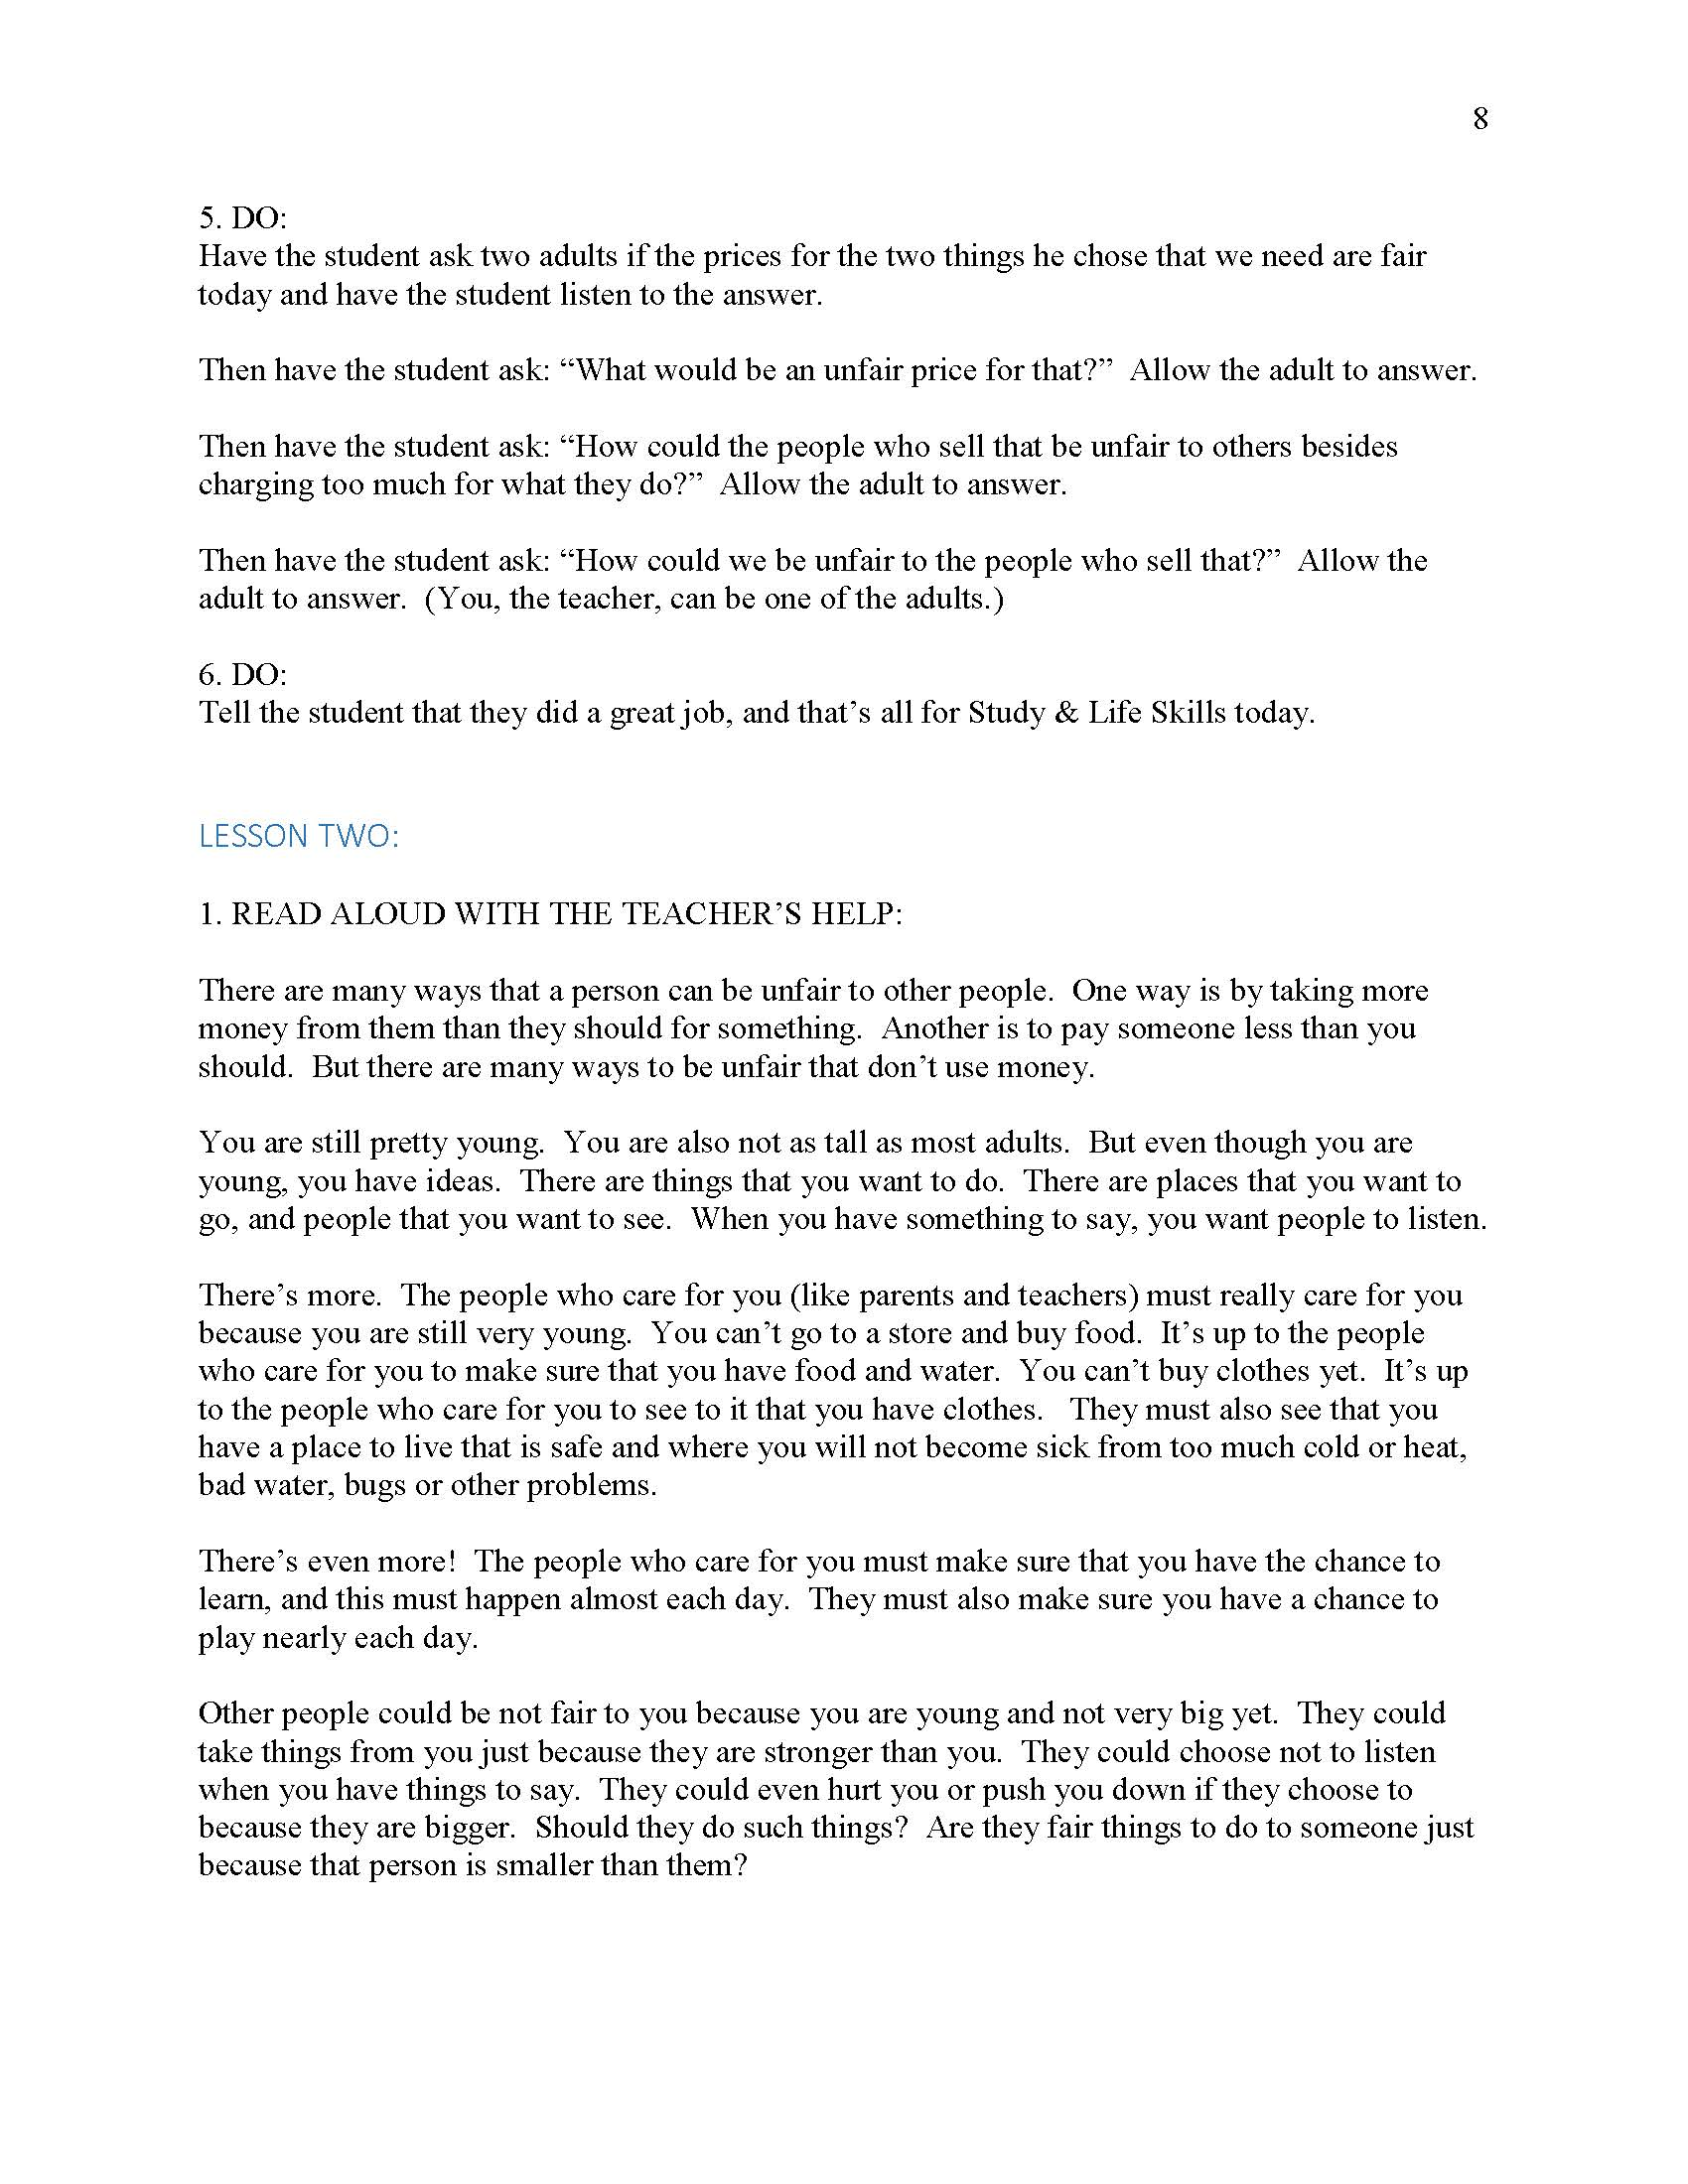 Step 1 Study & Life Skills 7 - What's Fair_Page_09.jpg